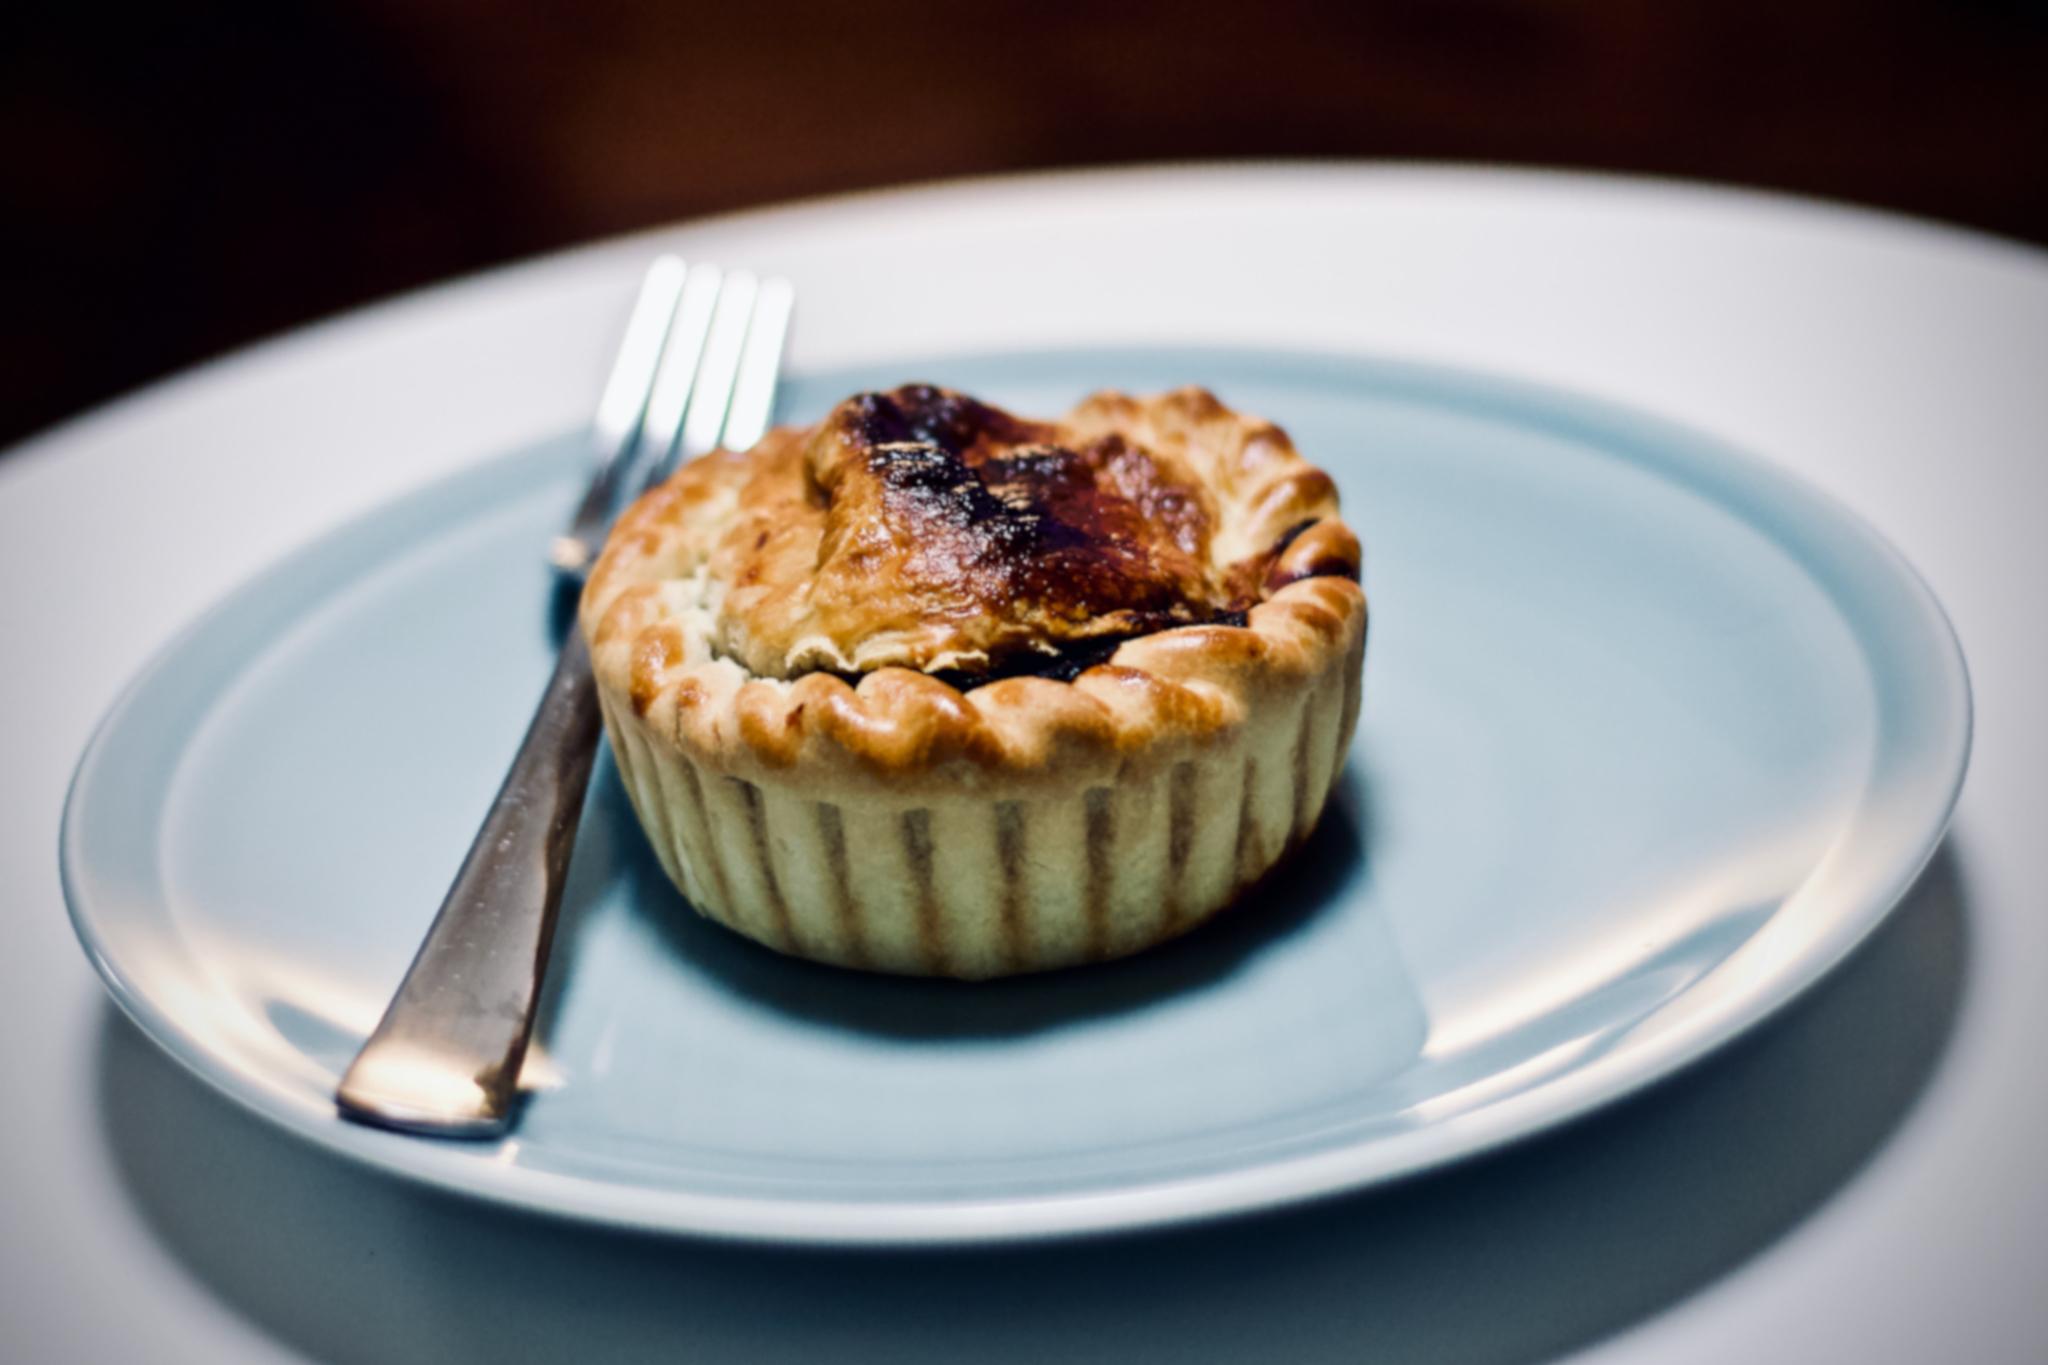 MINI PIE HOLES - Homemade Mini PiesCustomized Flavors like:Elvis - PB | Apple CrispMexican Chocolate Mousse | S'MoresIce Cream